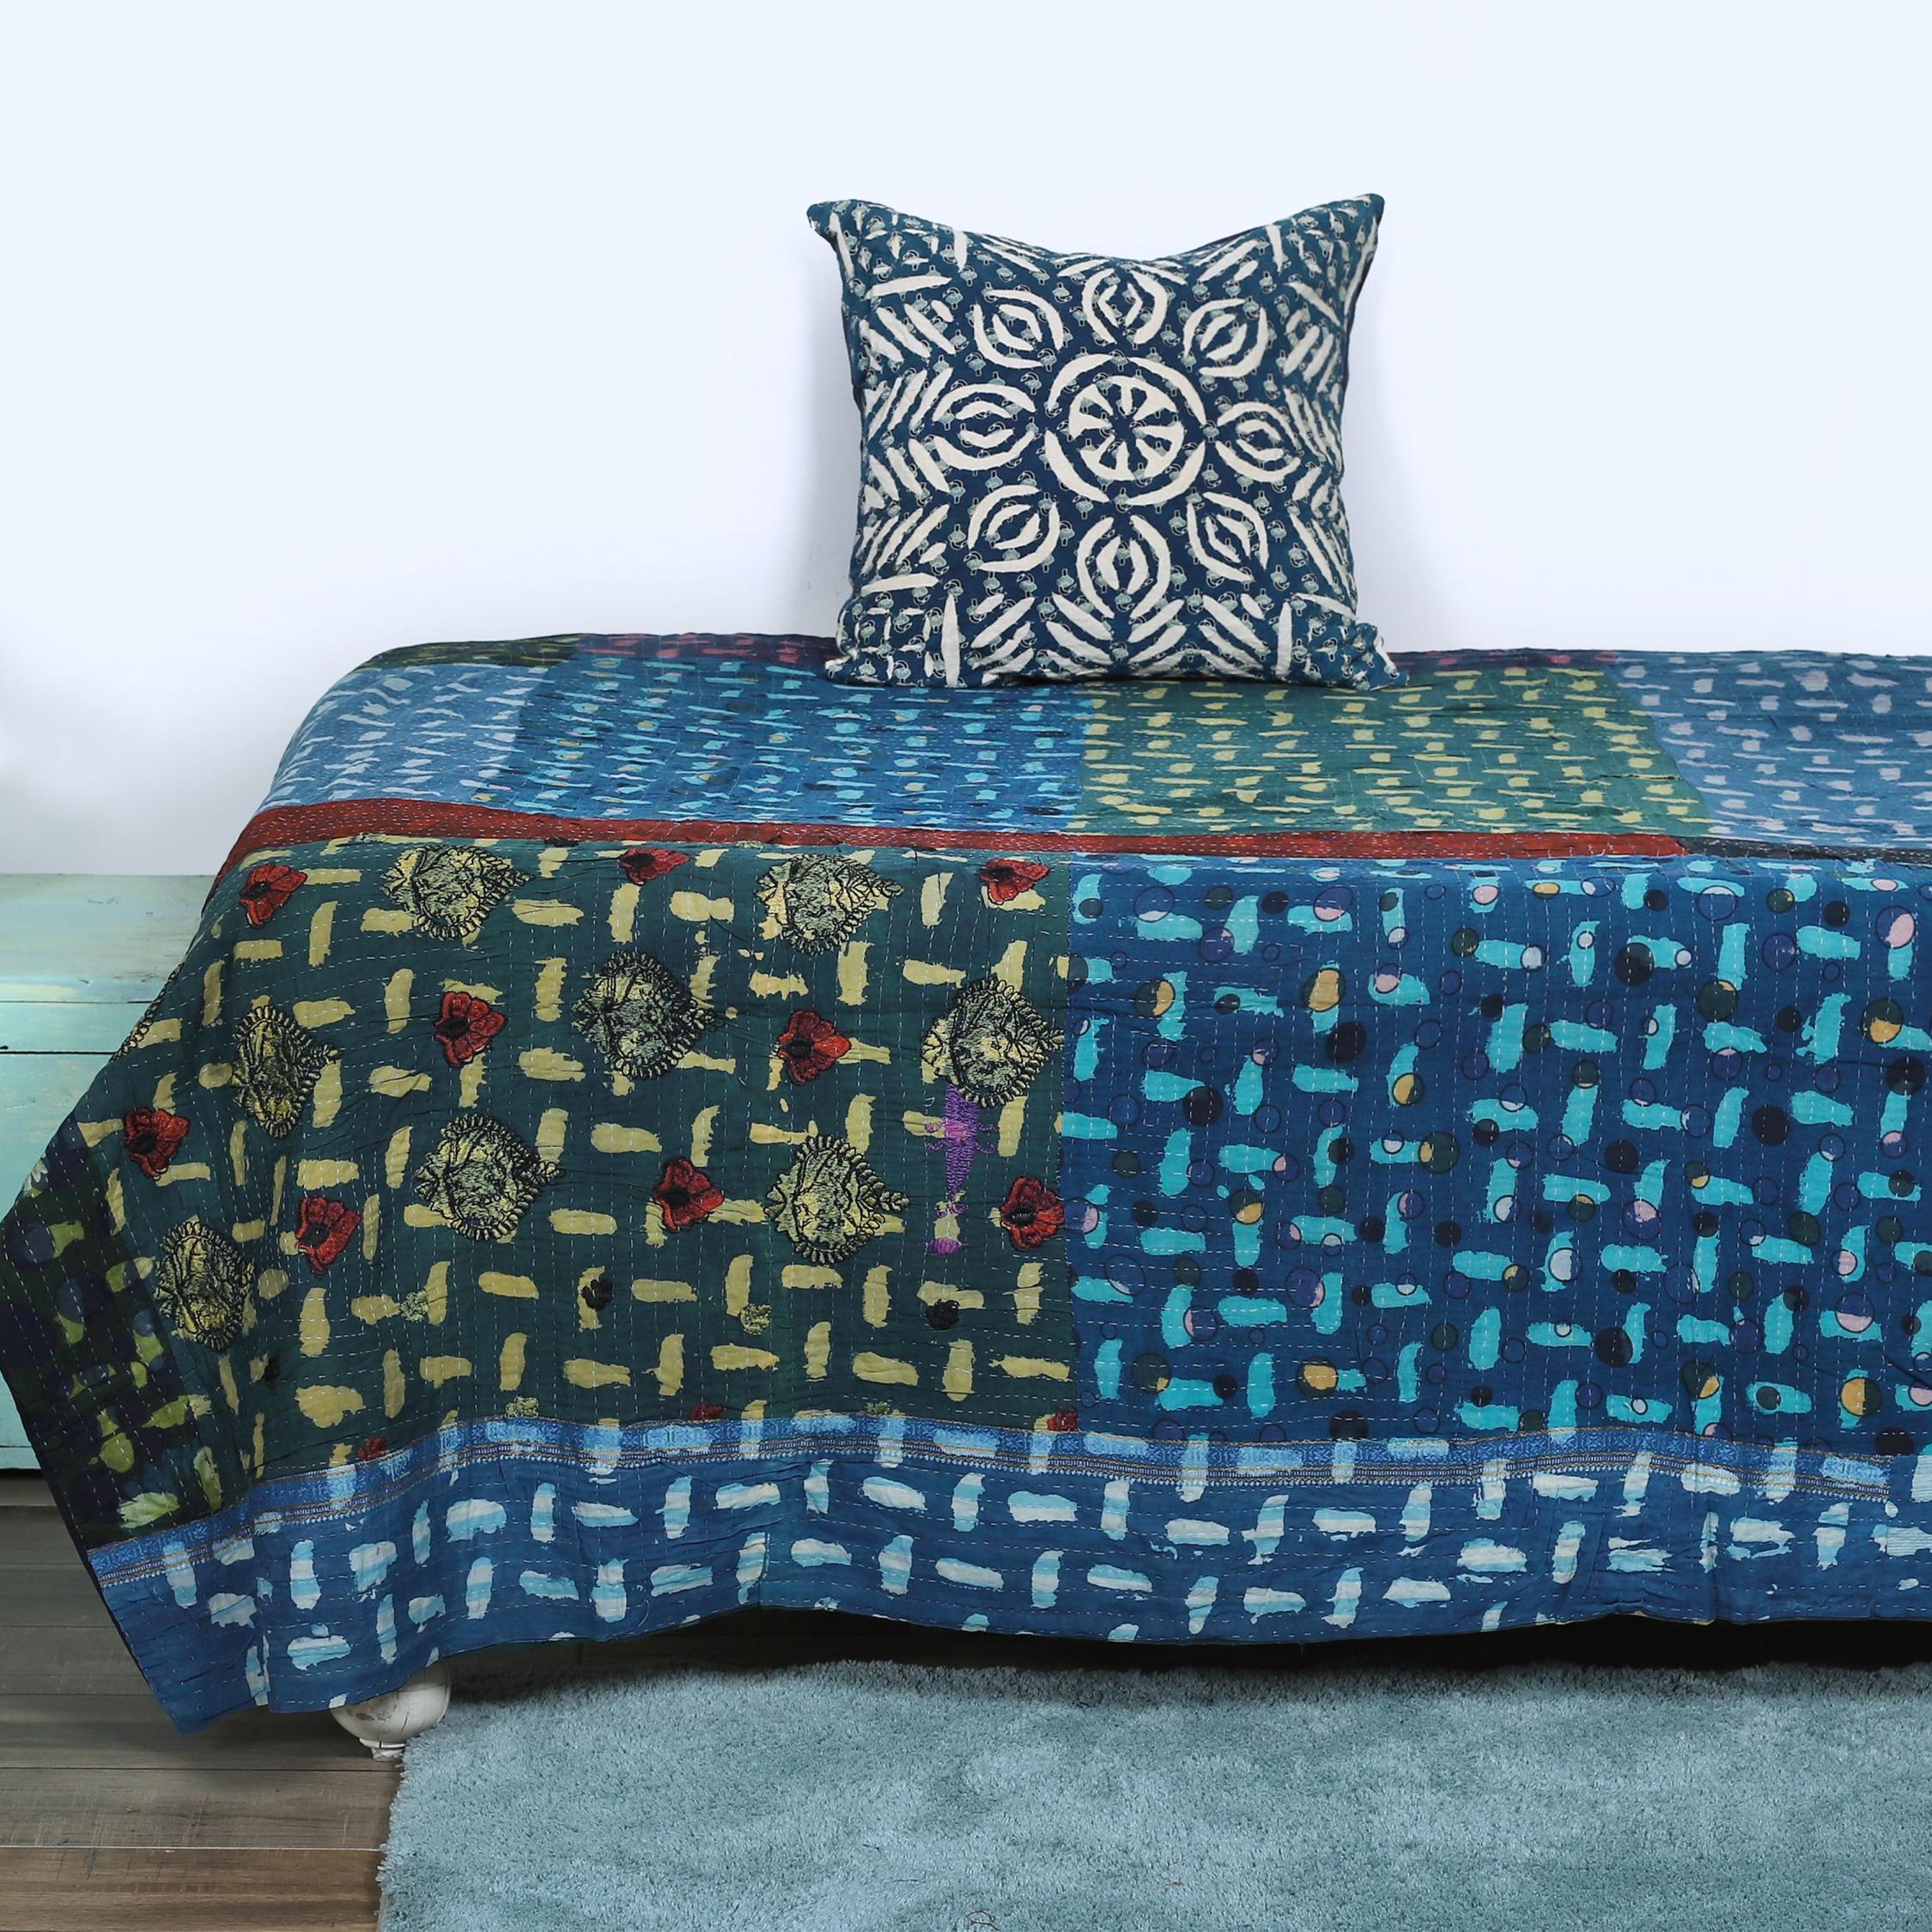 Home, Furniture & Diy Bedspread Cotton Blanket Vintage Quilt Throw Ralli Gudari Handmade Kantha Quilt Meticulous Dyeing Processes Bedding